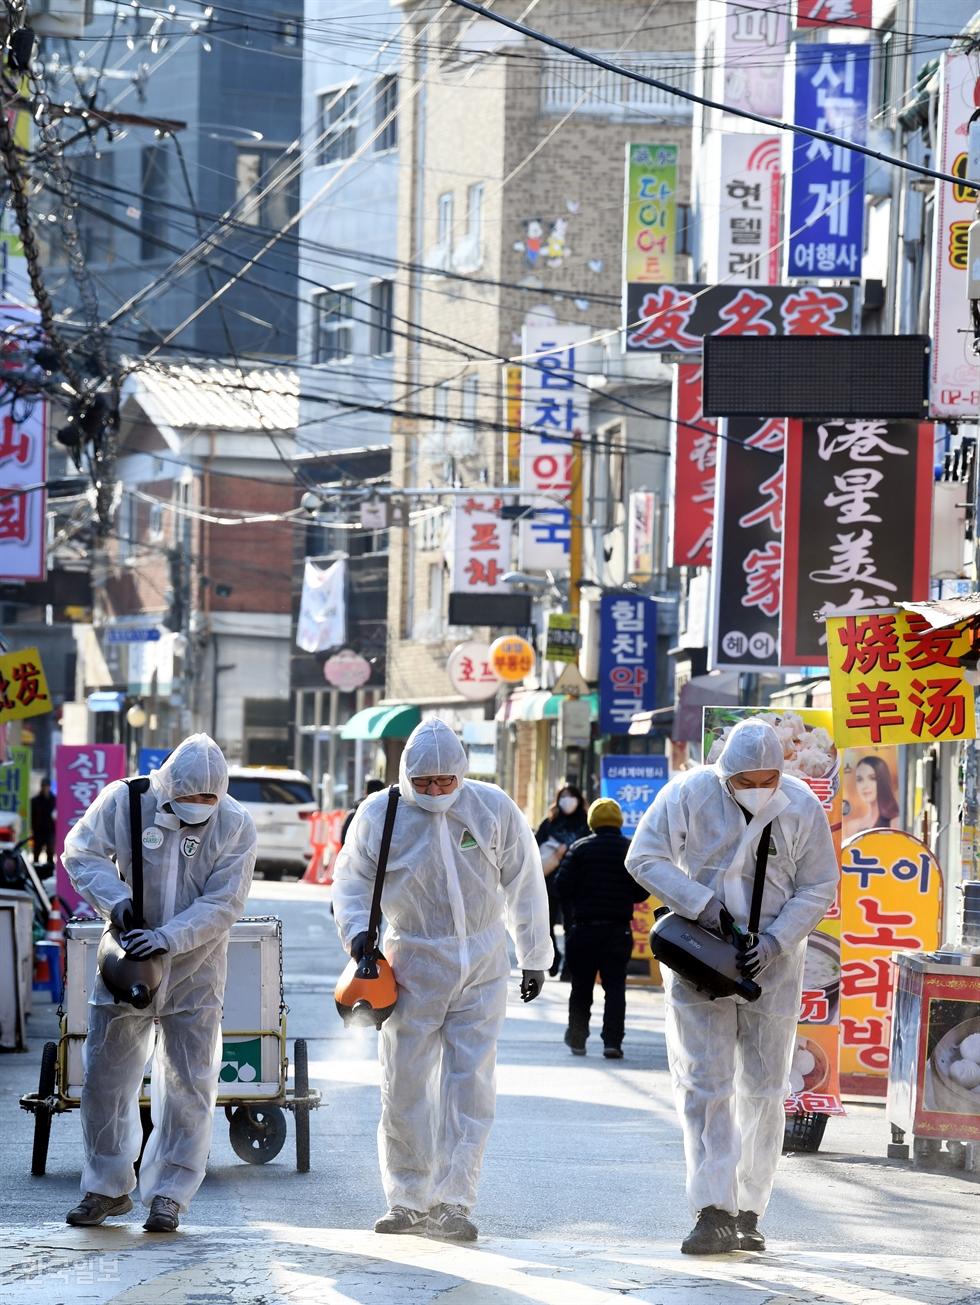 Seoul city inspects restaurants for bat meat consumption